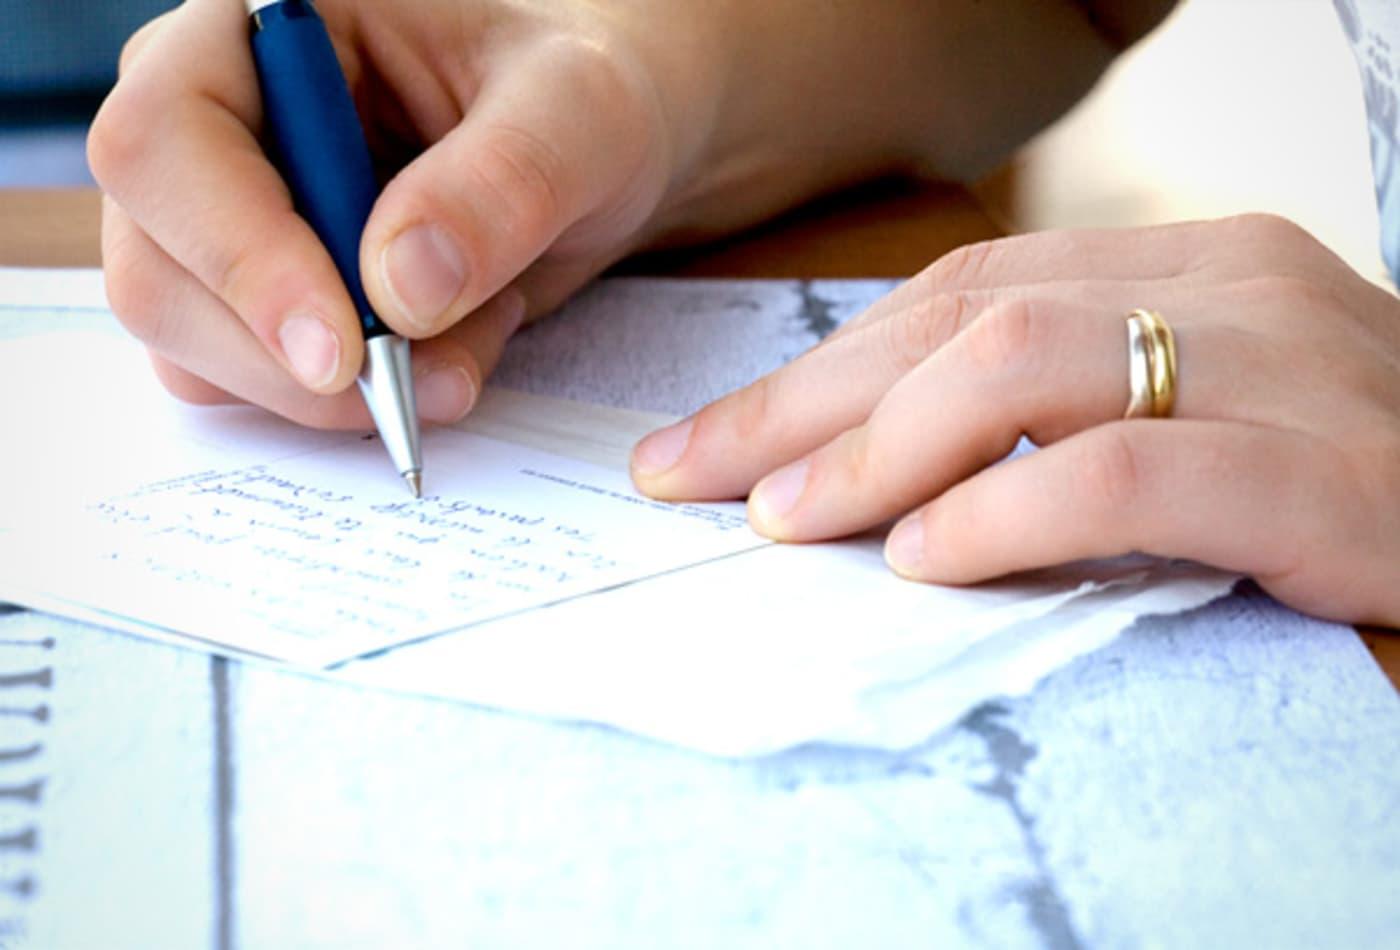 Handwriting-Professional-Easy-High-Paying-Jobs-CNBC.jpg